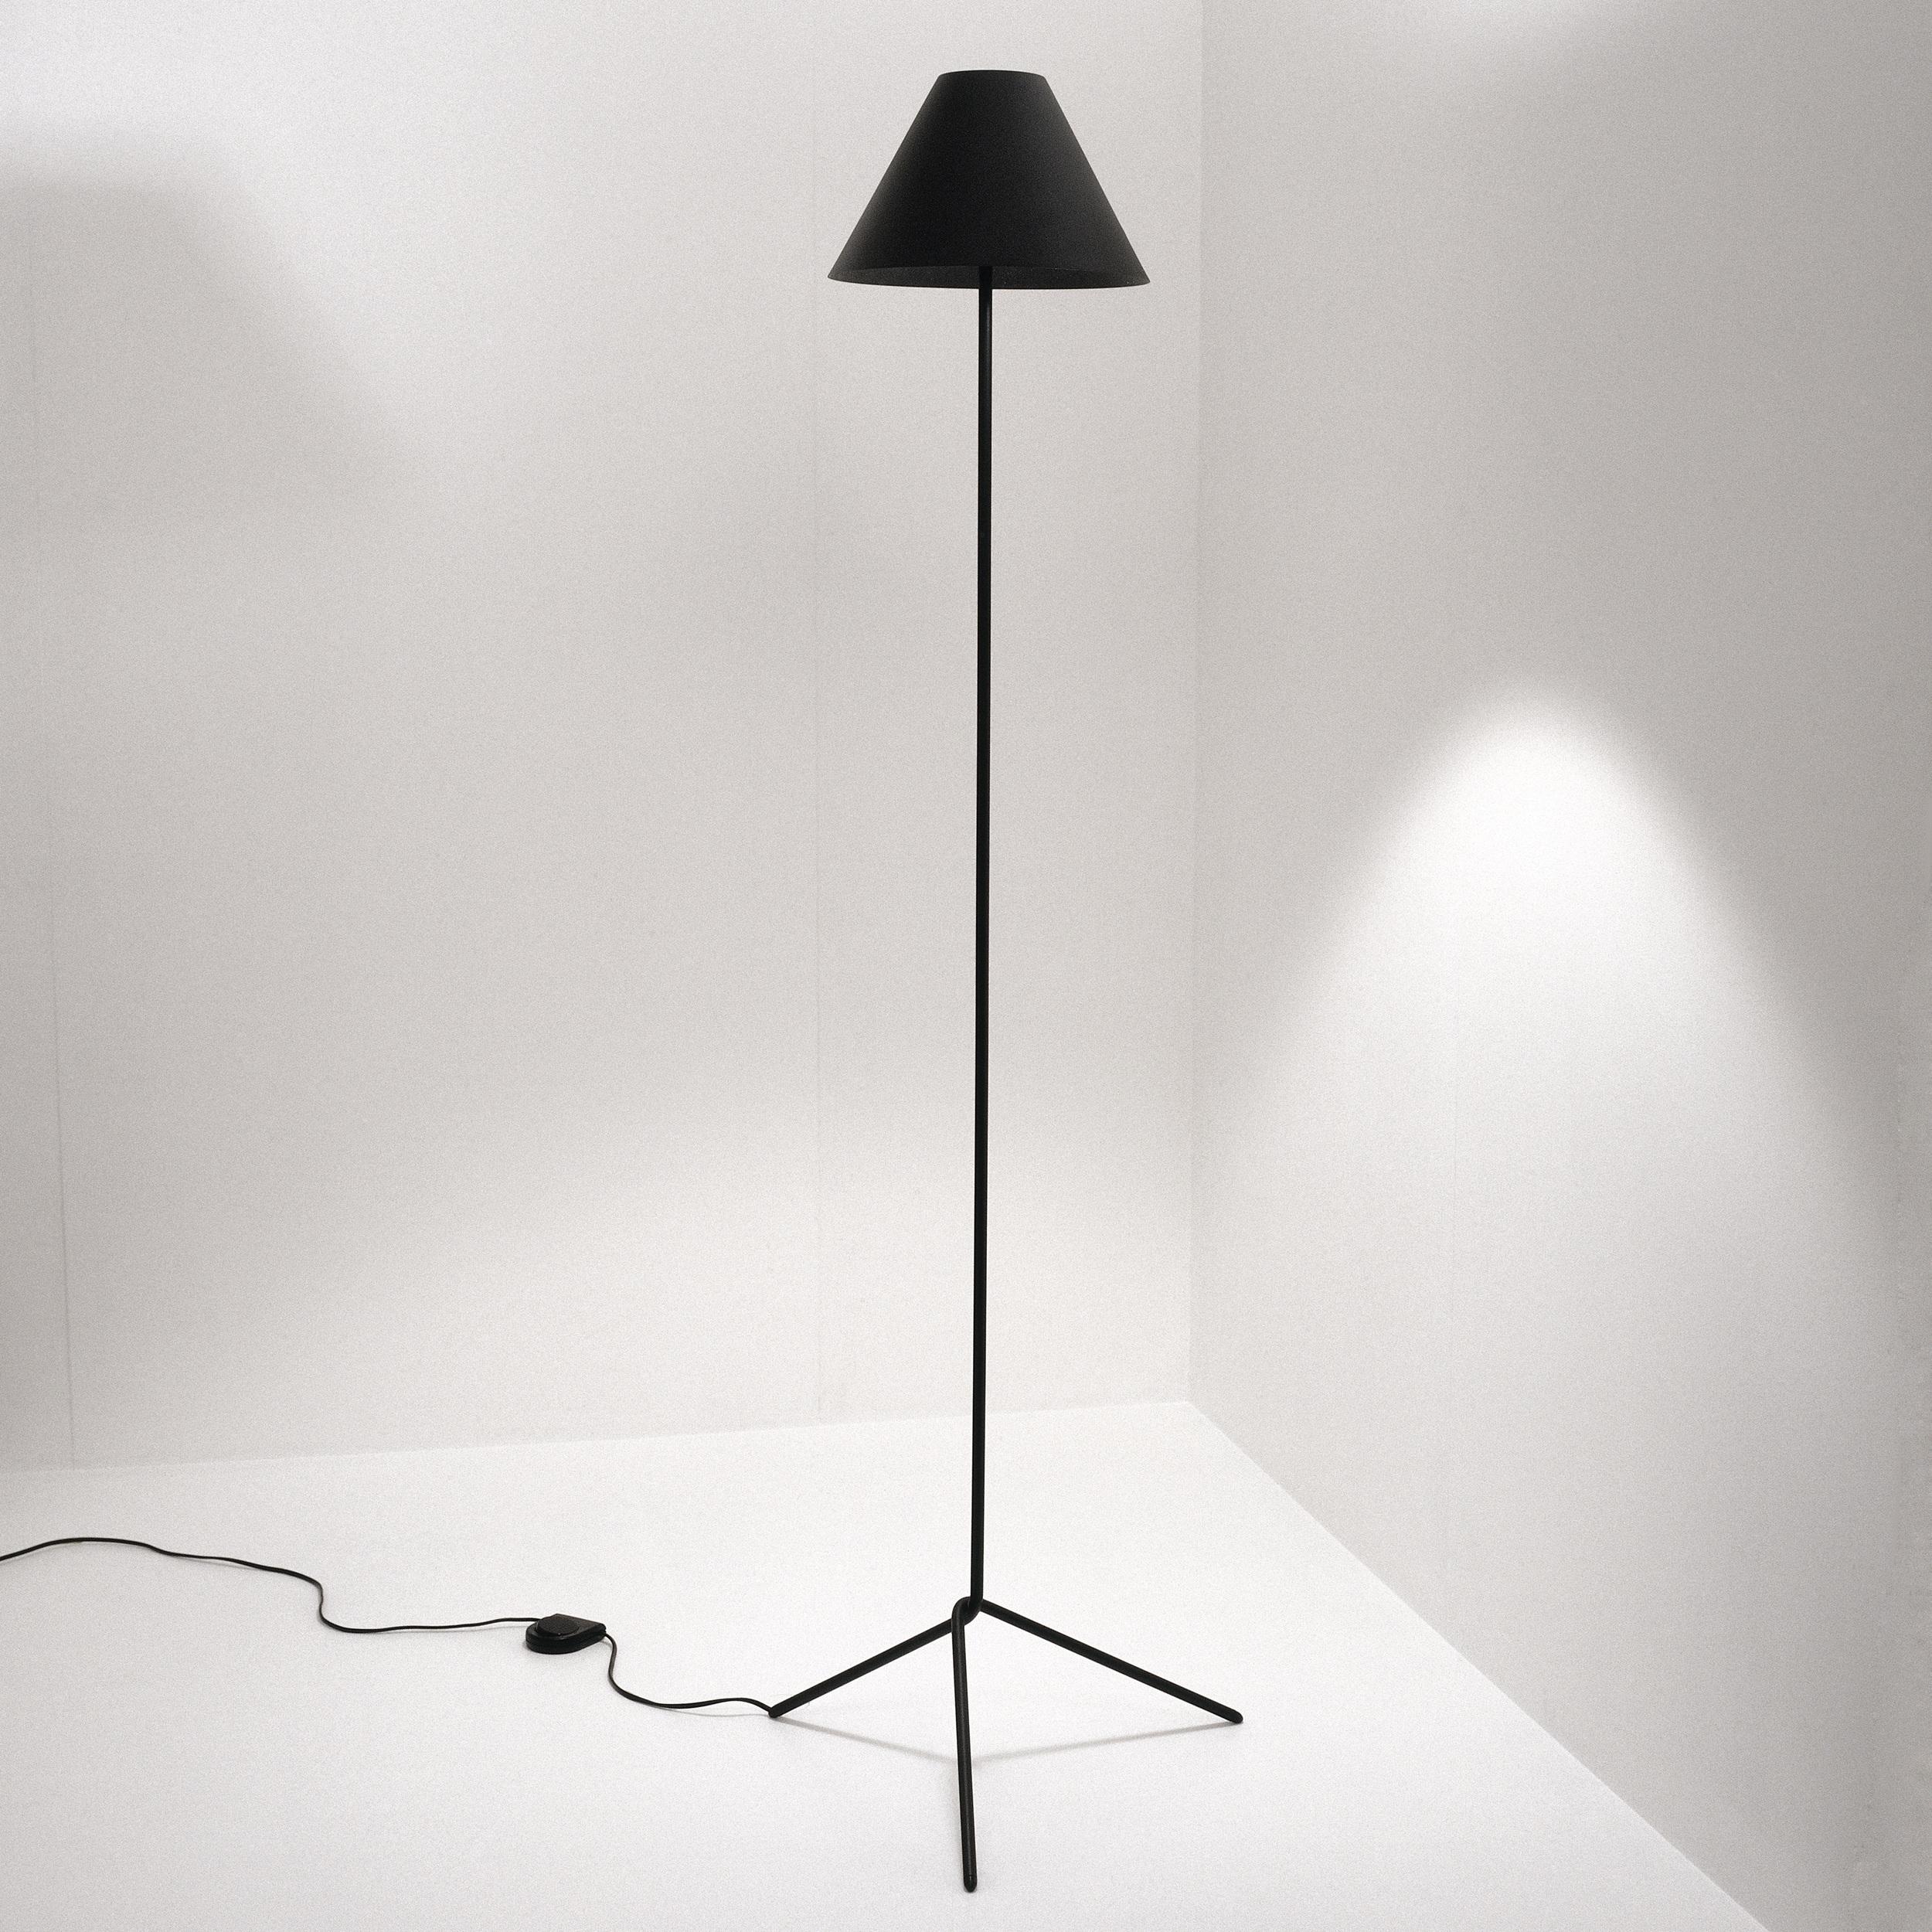 ISM Objects_Shady_black_Floor Lamp 2.jpg